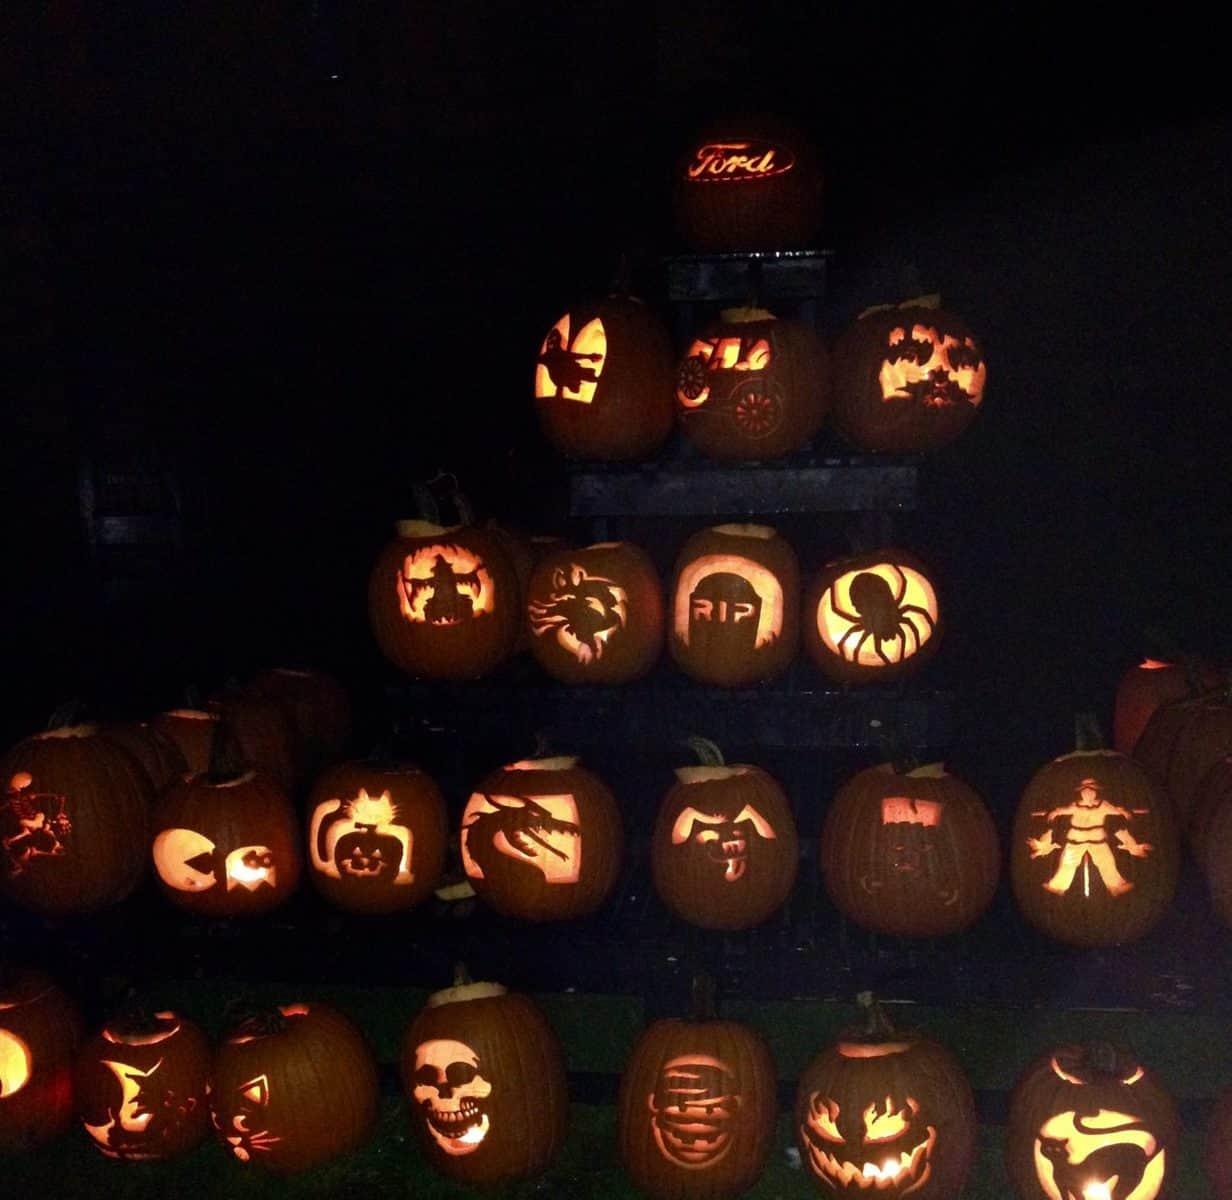 halloween-at-greenfield-village-jack-o-lanterns   Ann Arbor with Kids